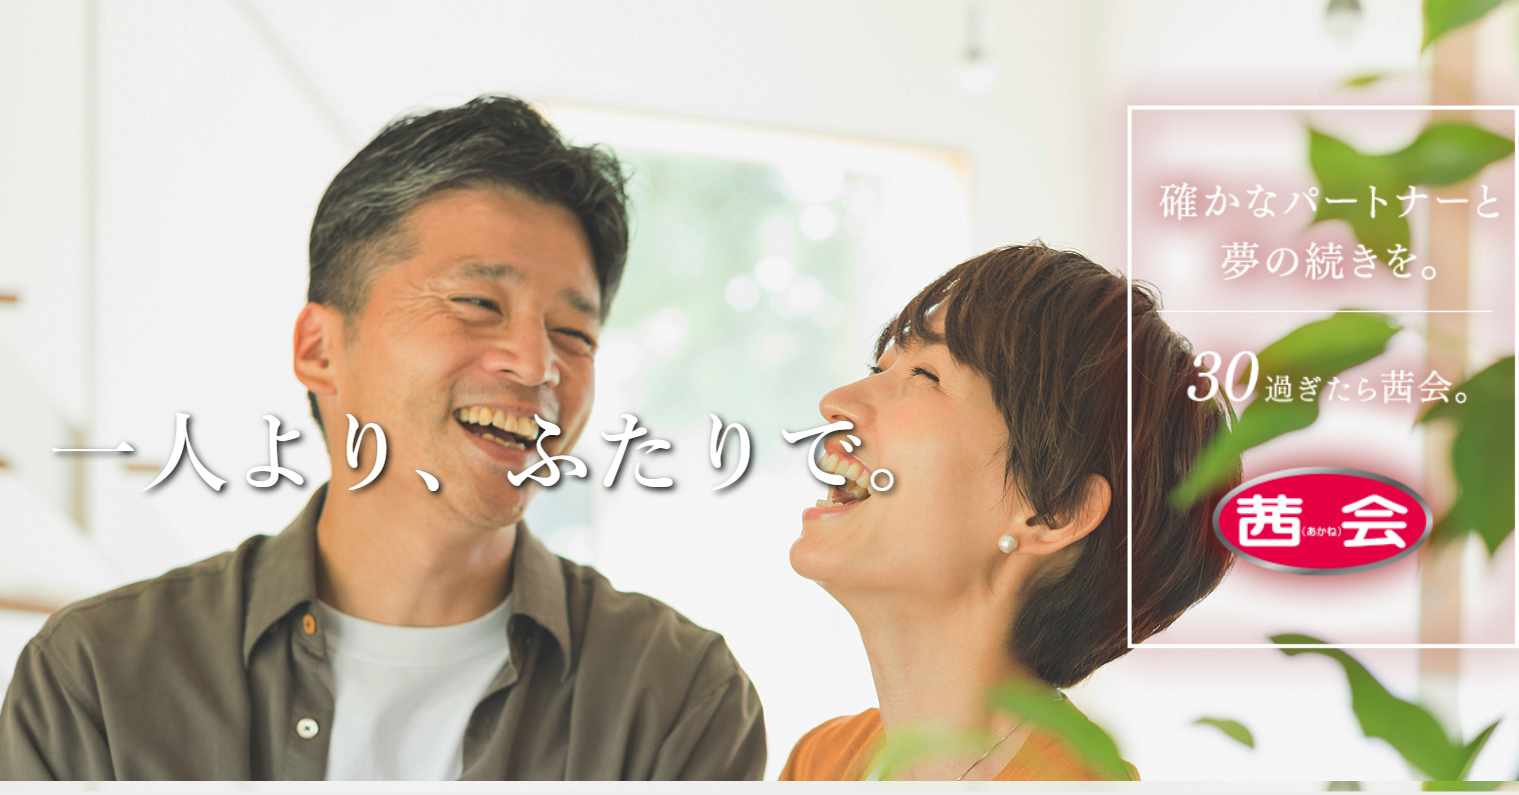 茜会 - www.akanekai.co.jp